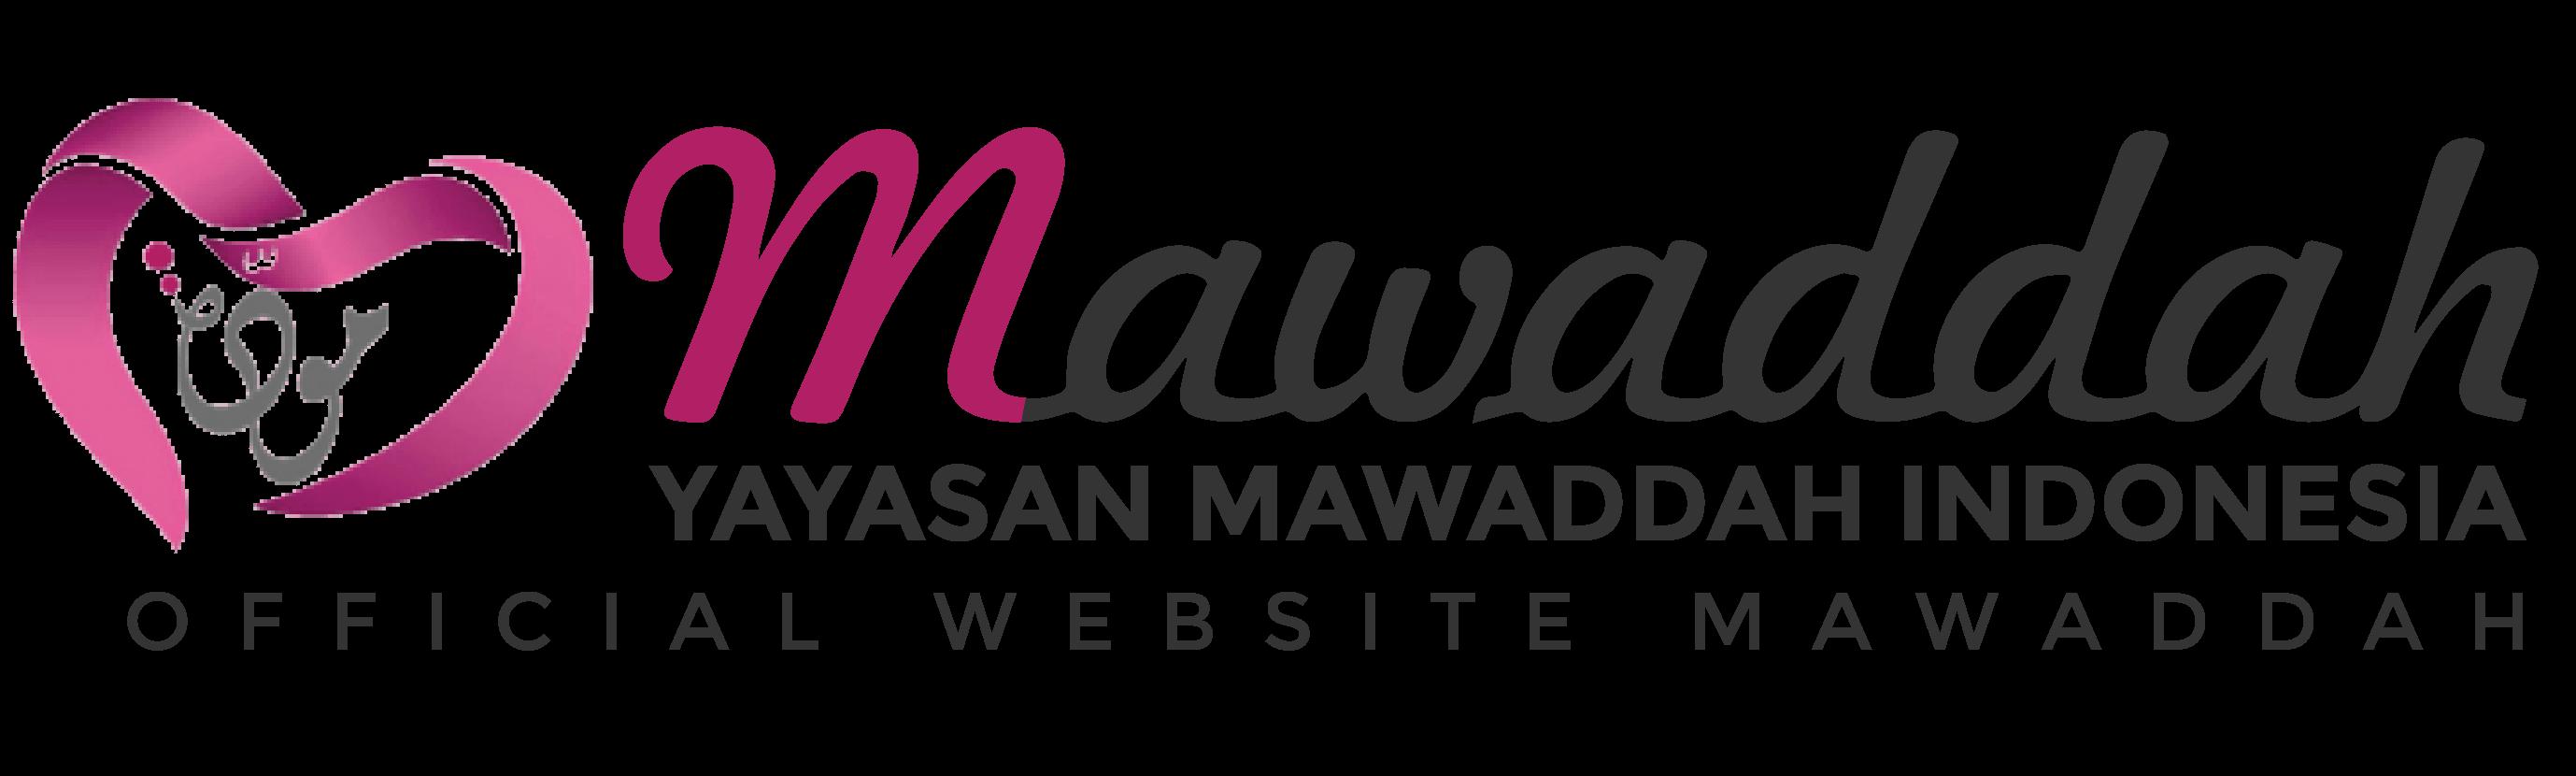 MAWADDAH